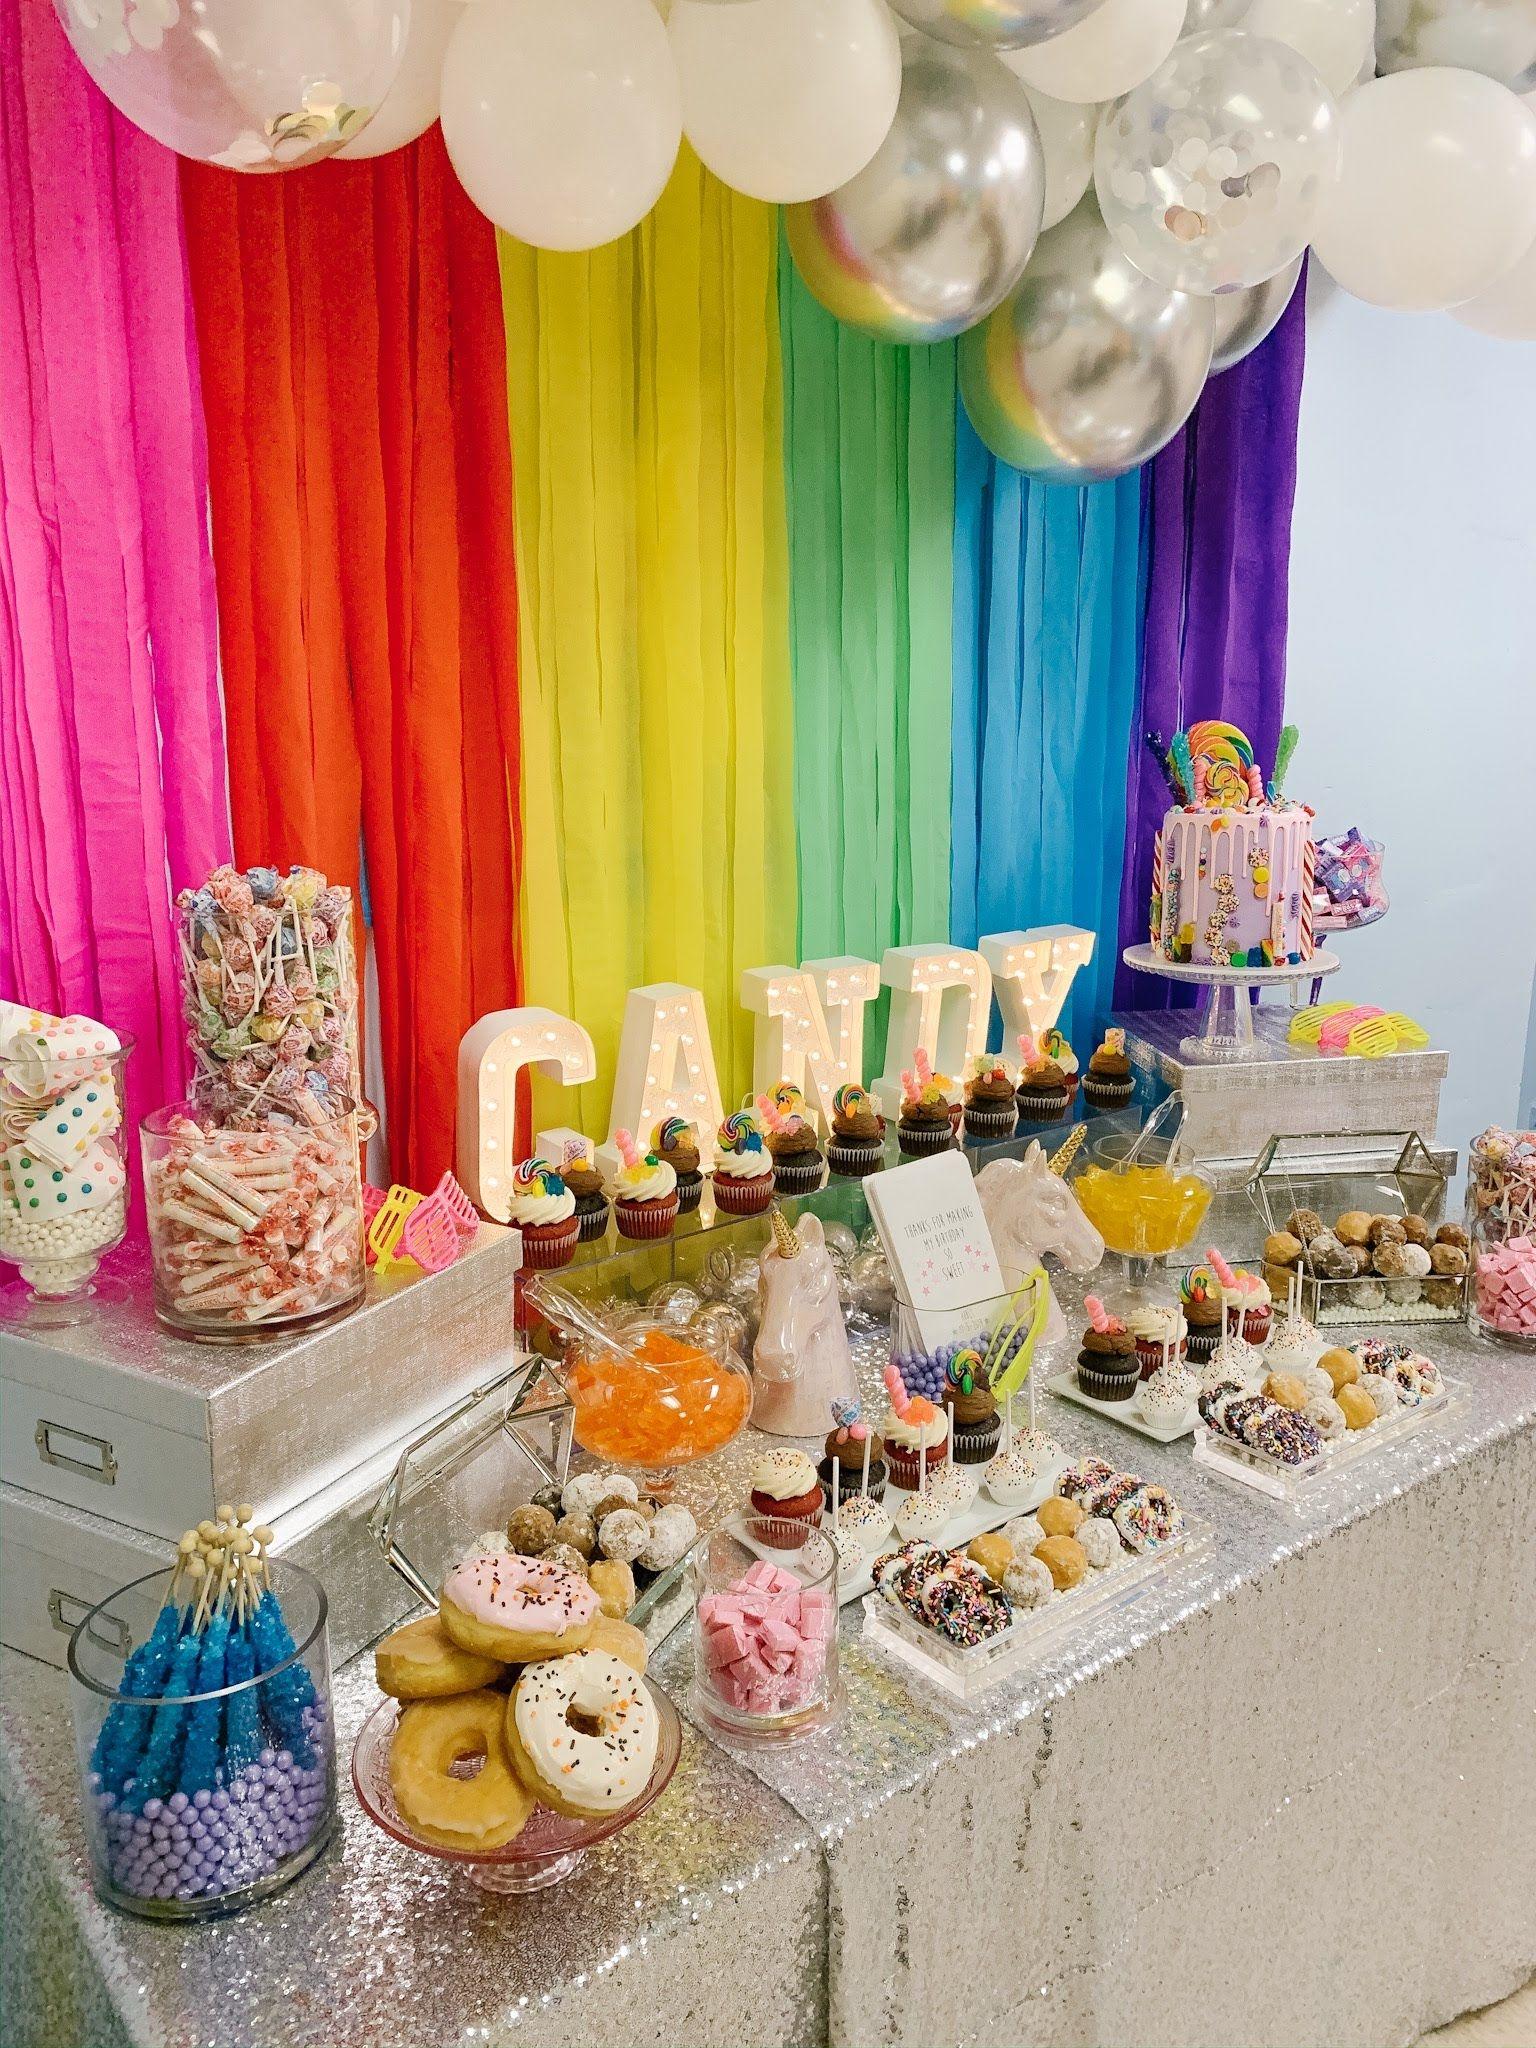 Sparkles Rainbows Girl Birthday Decorations Girls Birthday Party Themes Girls Birthday Party Decorations